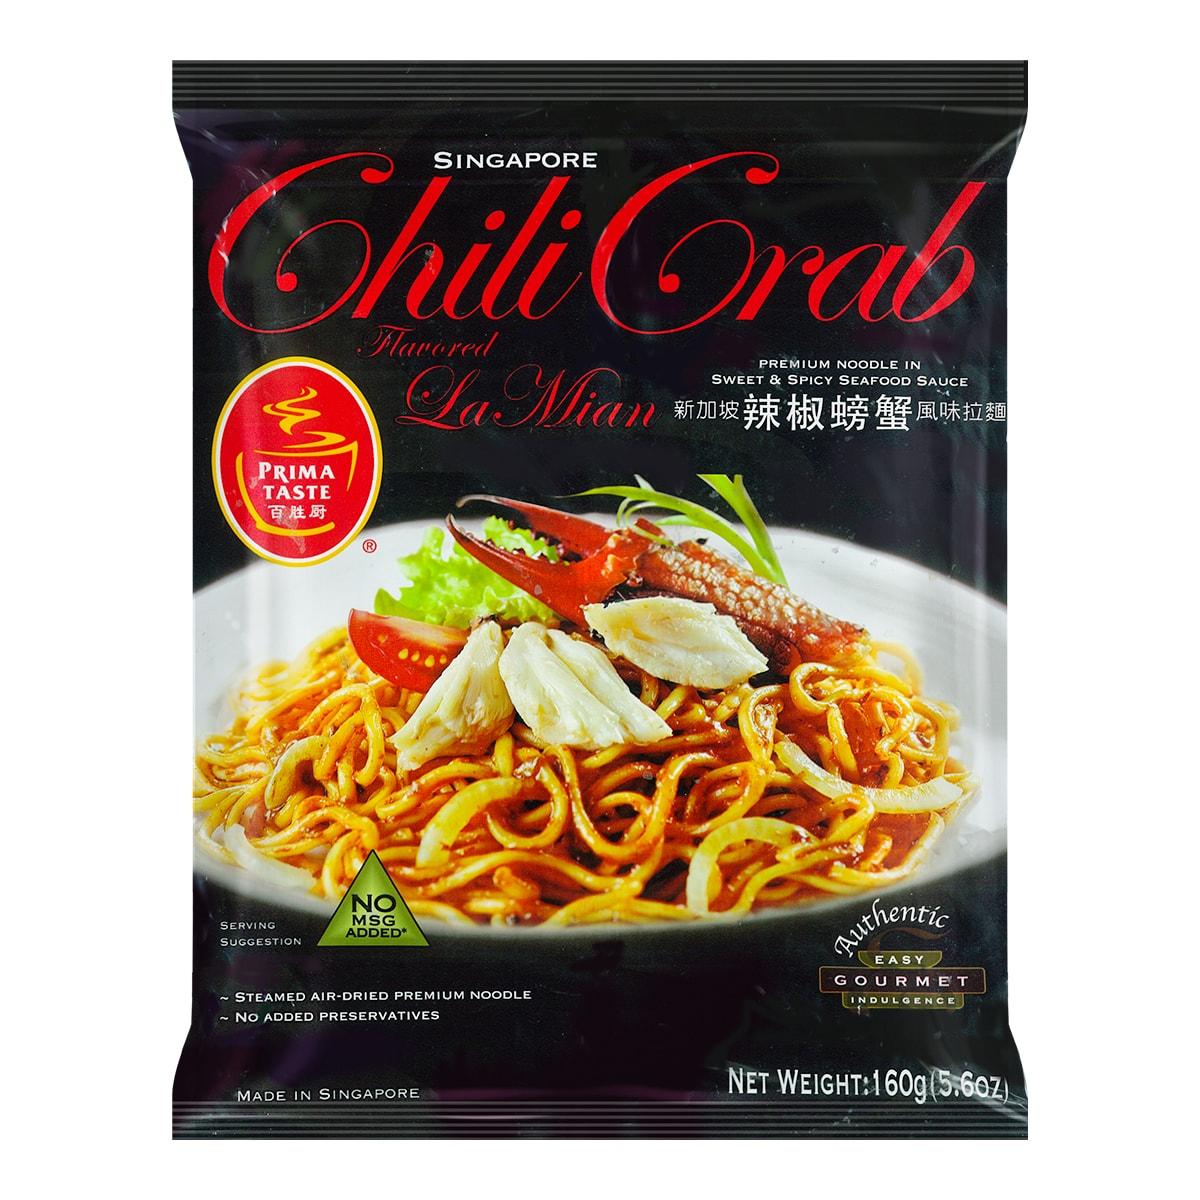 PRIMA TASTE Chili Crab Noodle 160g